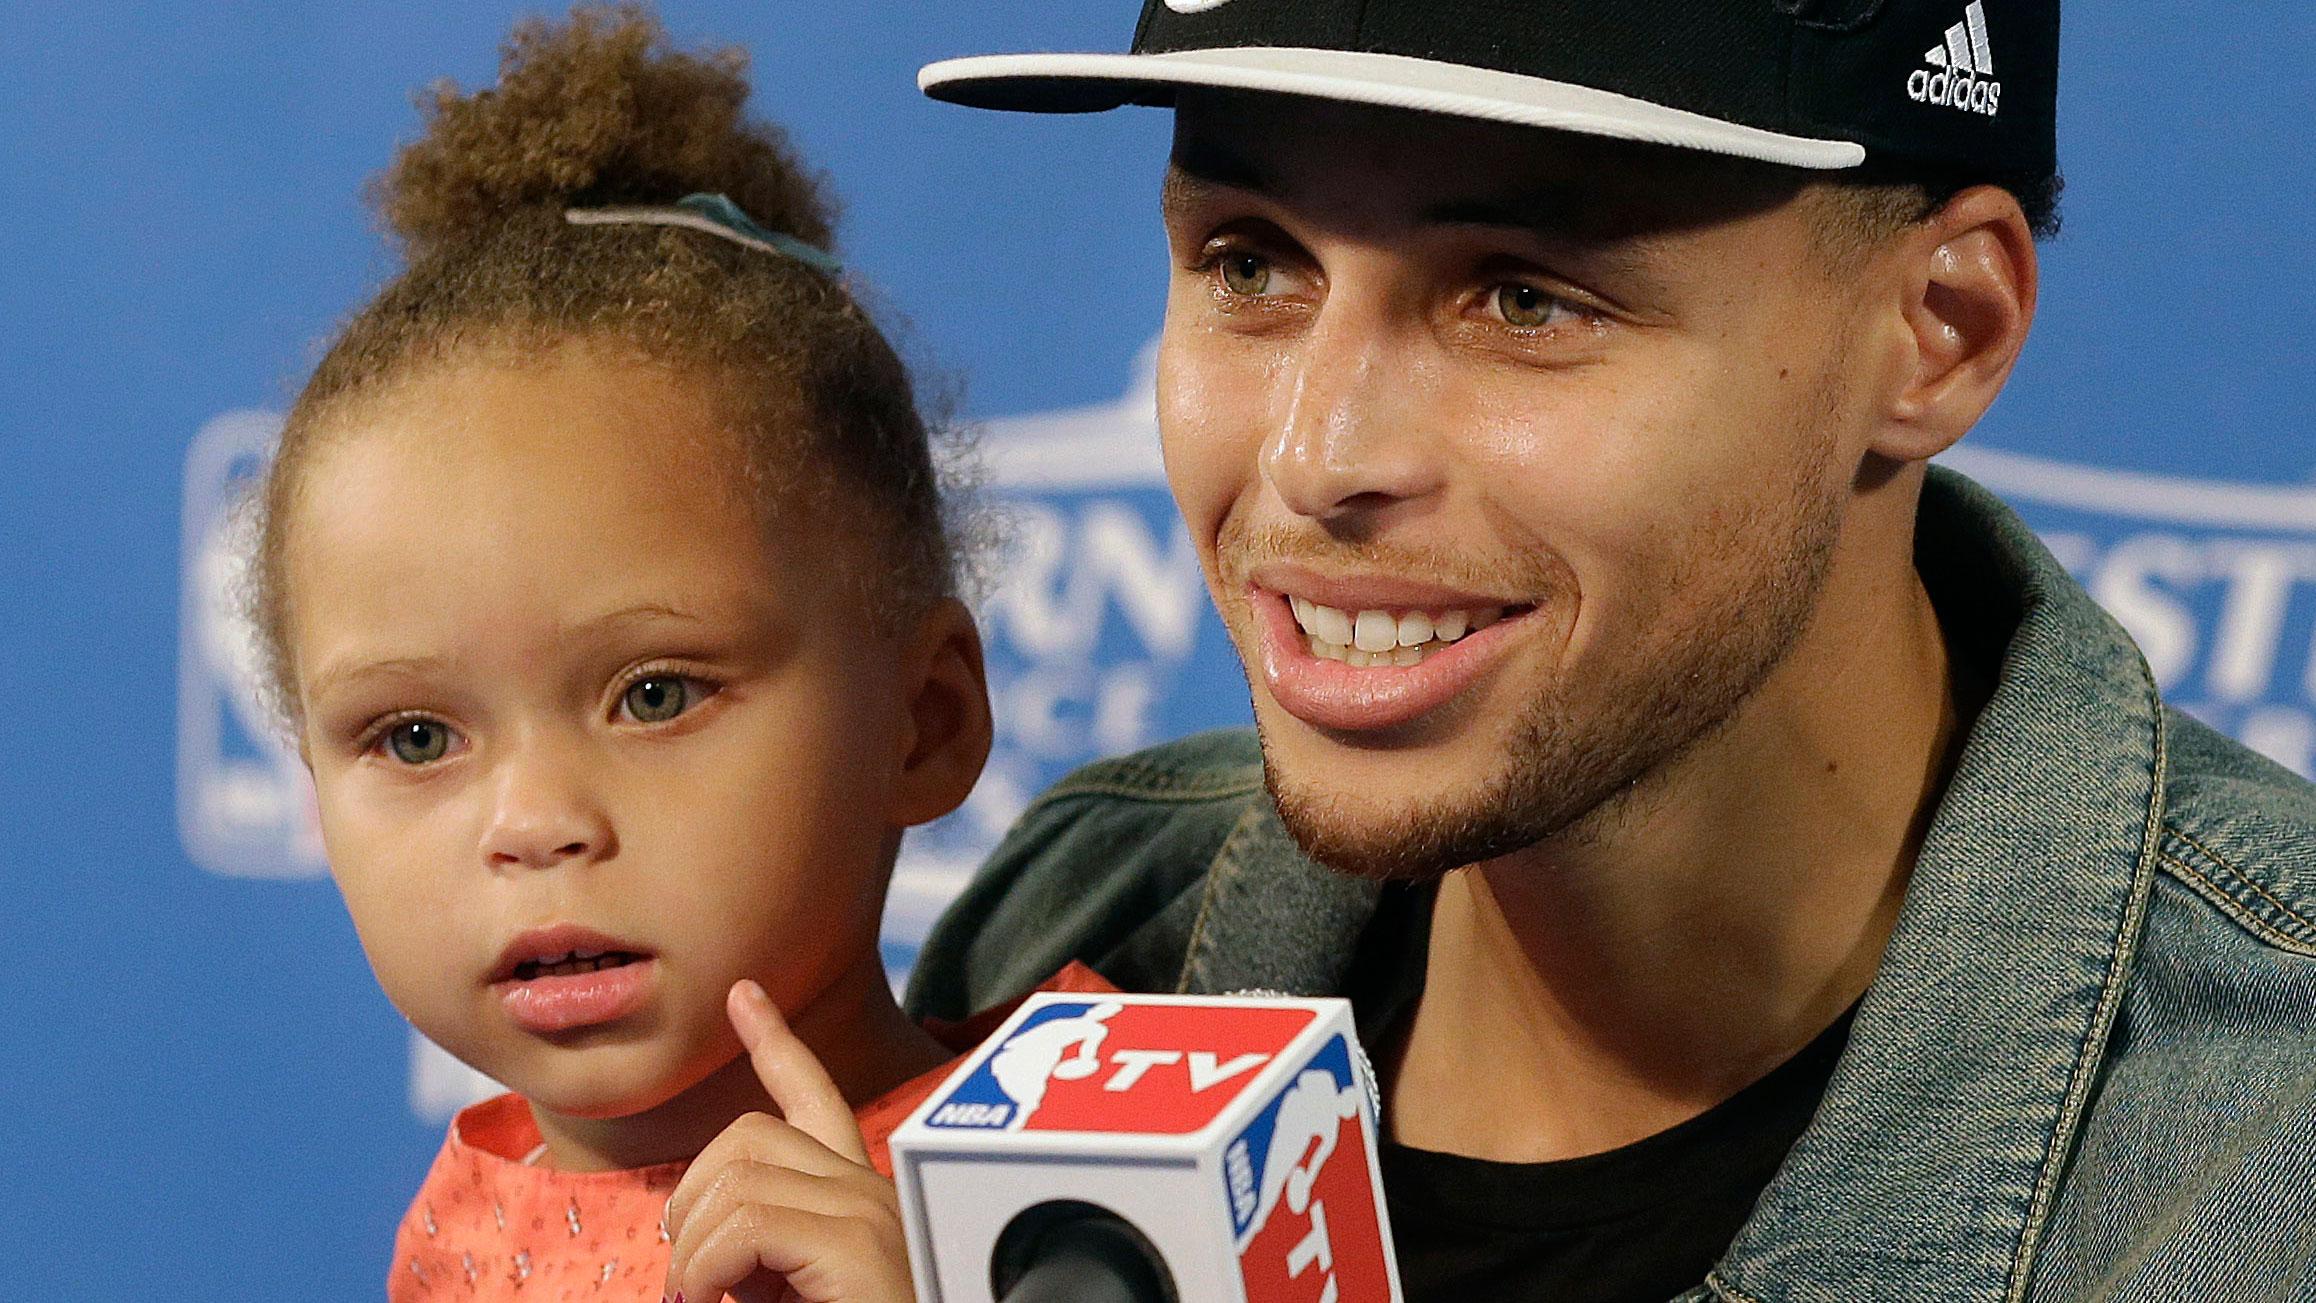 Nba Playoffs 2015 On Tv | All Basketball Scores Info